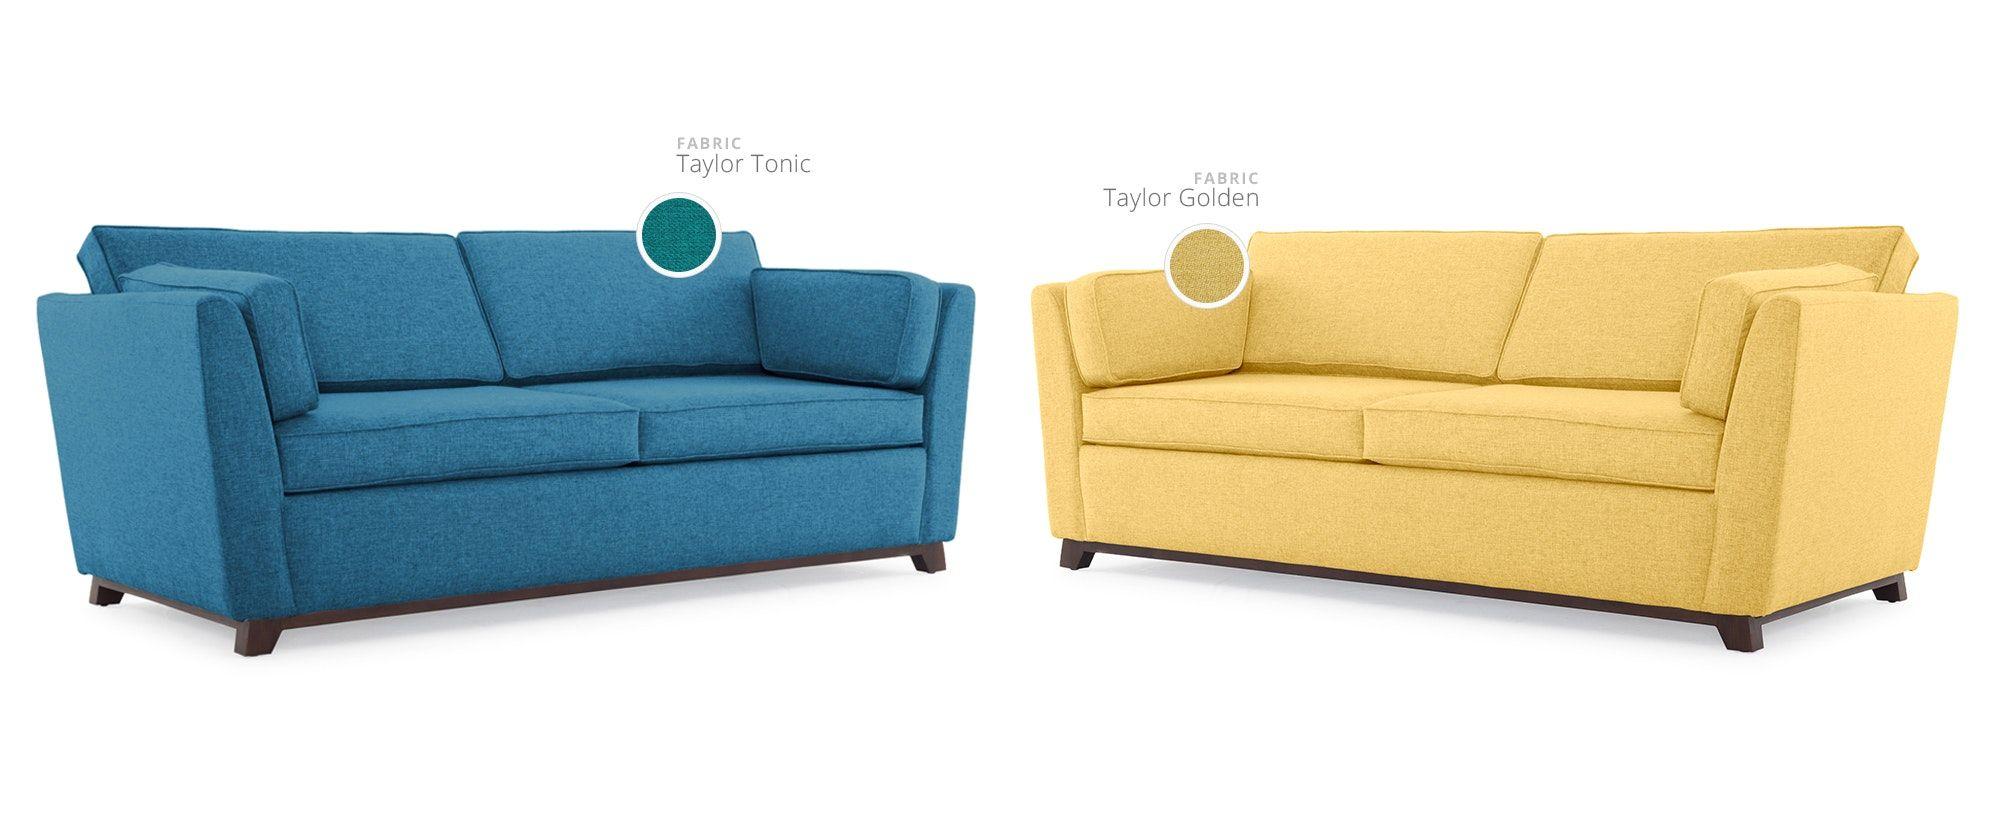 Roller Sleeper Sofa In 2018 New House Pinterest Sofa Sleeper